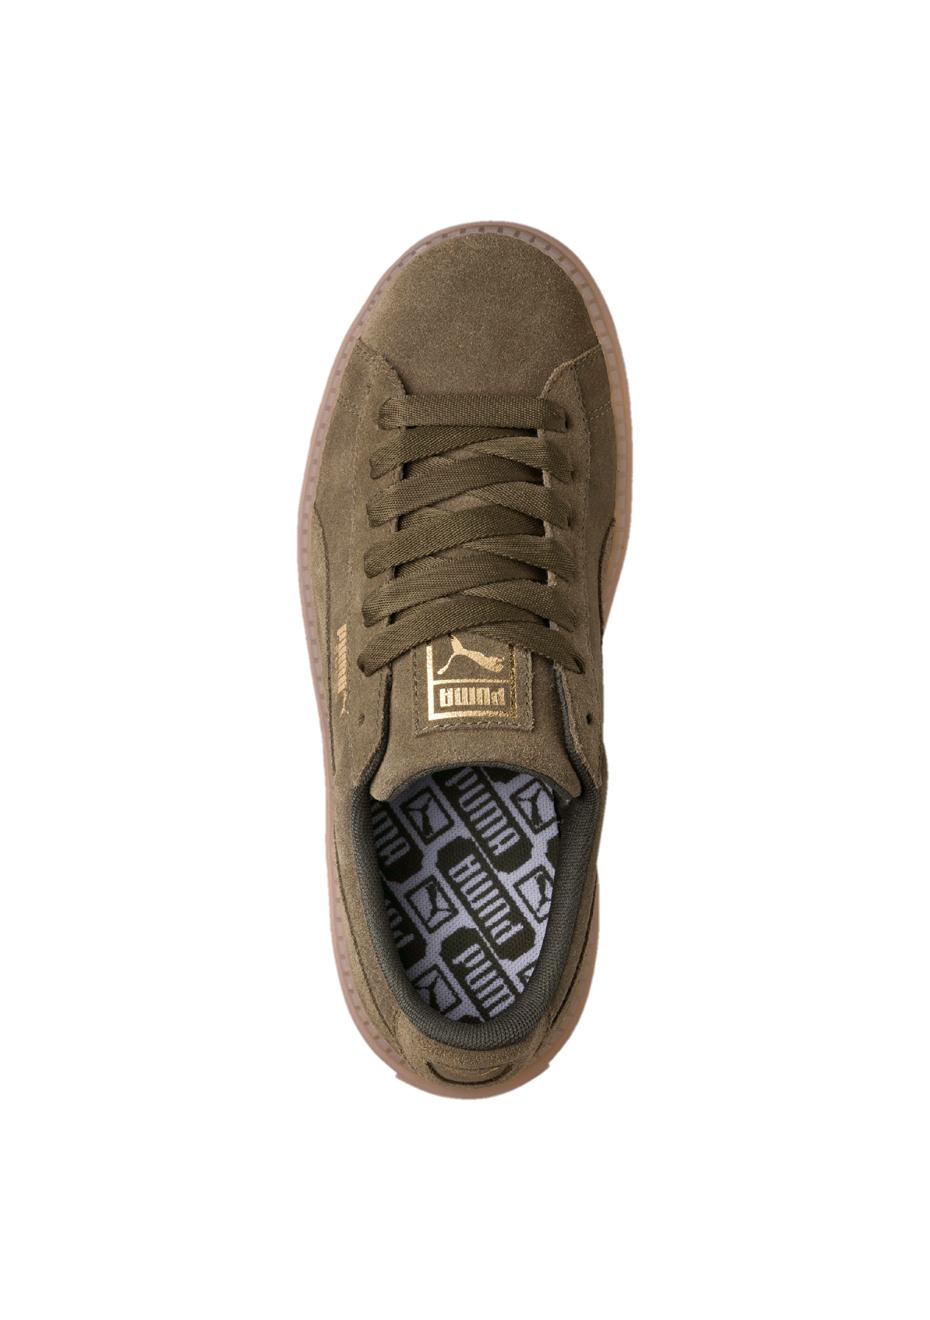 Street Womens Olive Suede Onceit Puma Trace Shoes Platform qZUwgT6X